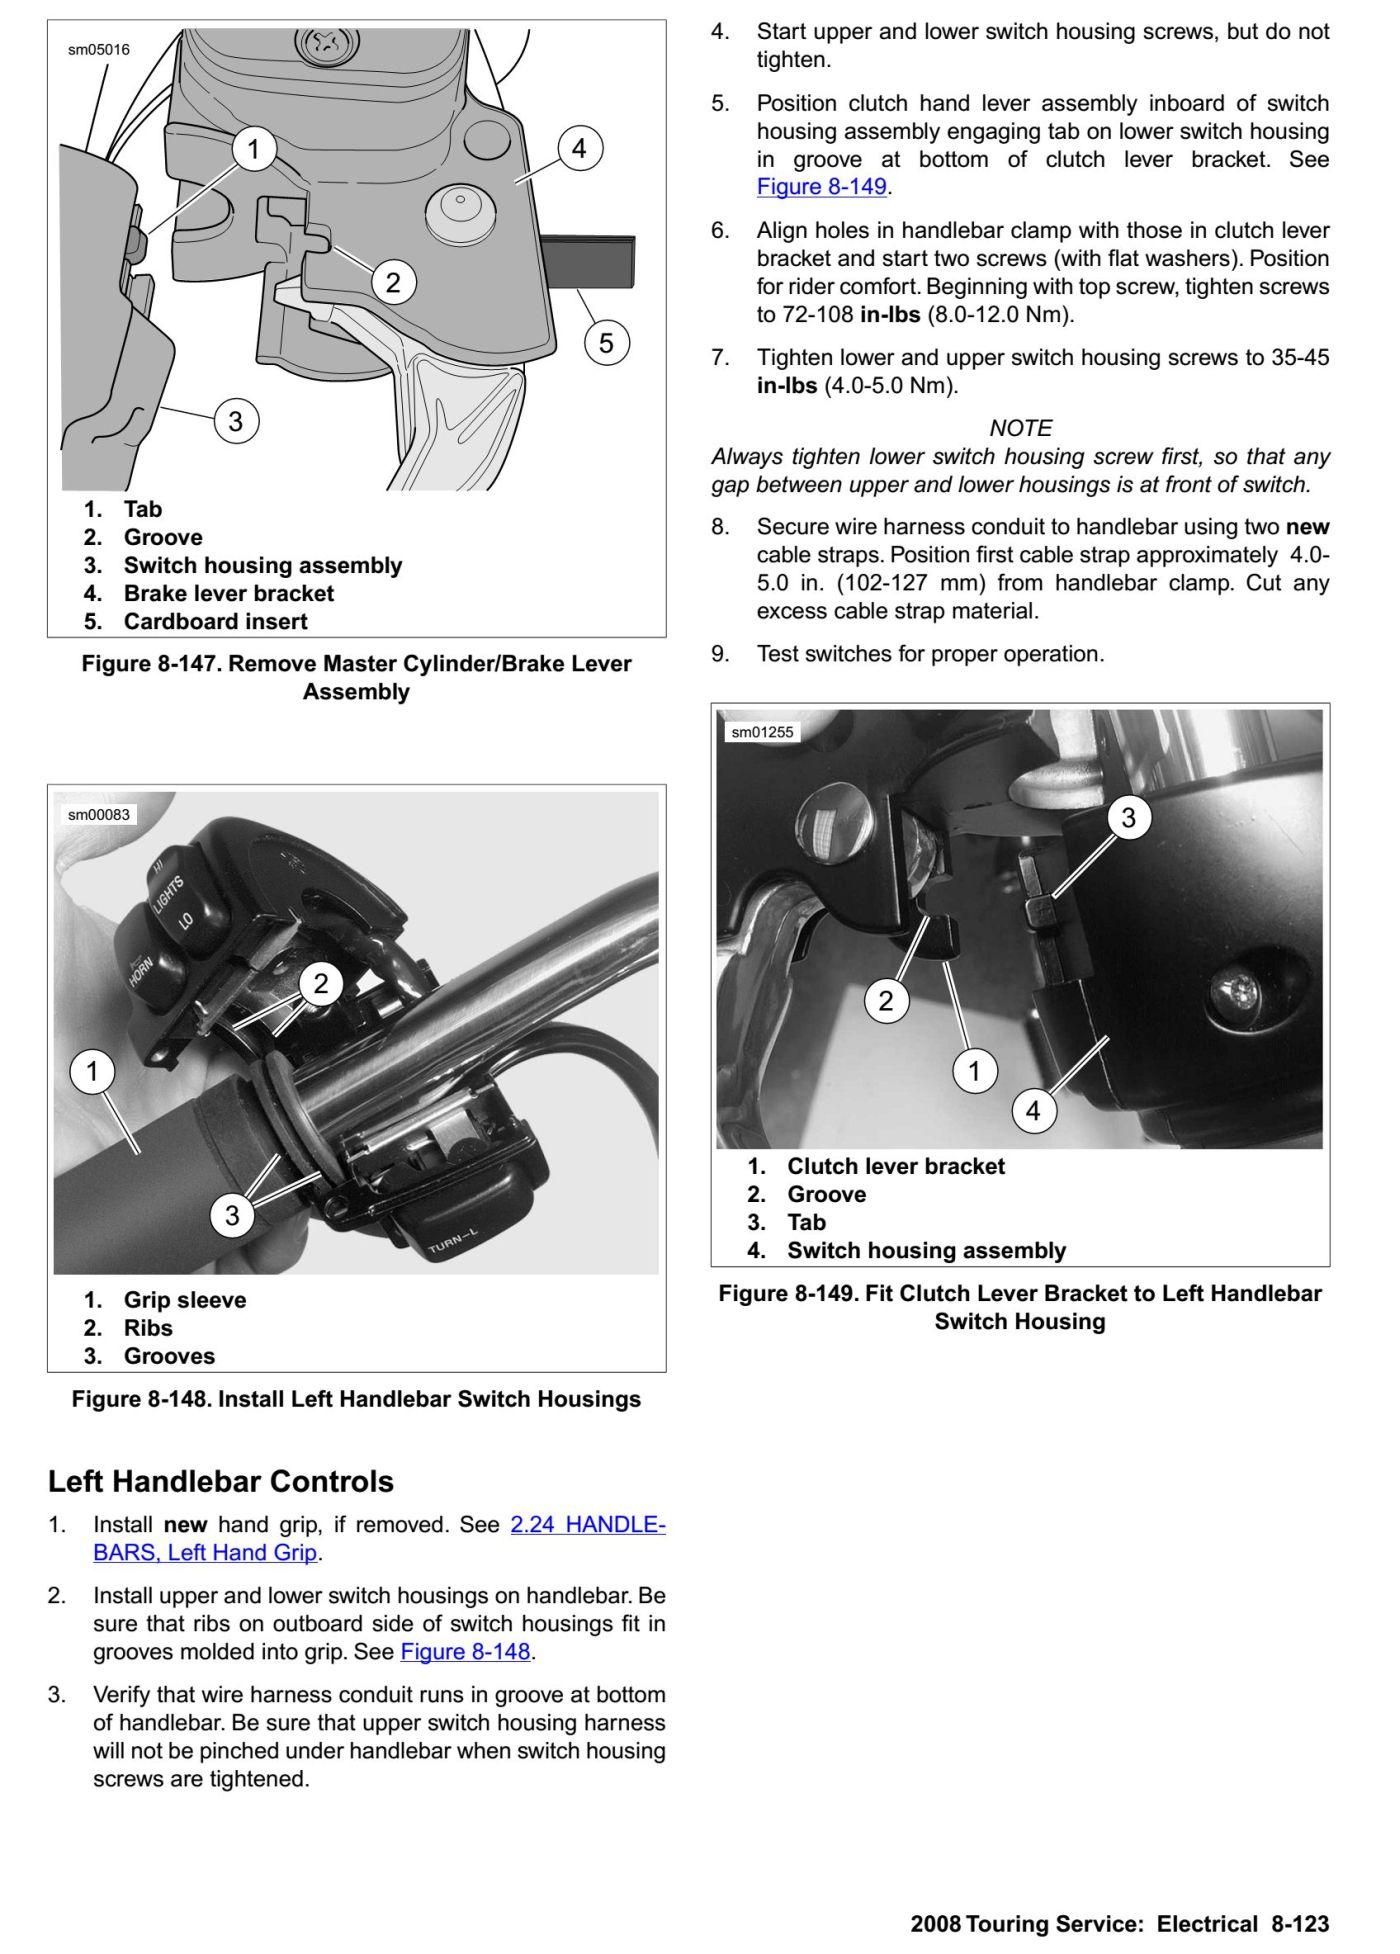 microsurgery practice manual 2008 buy